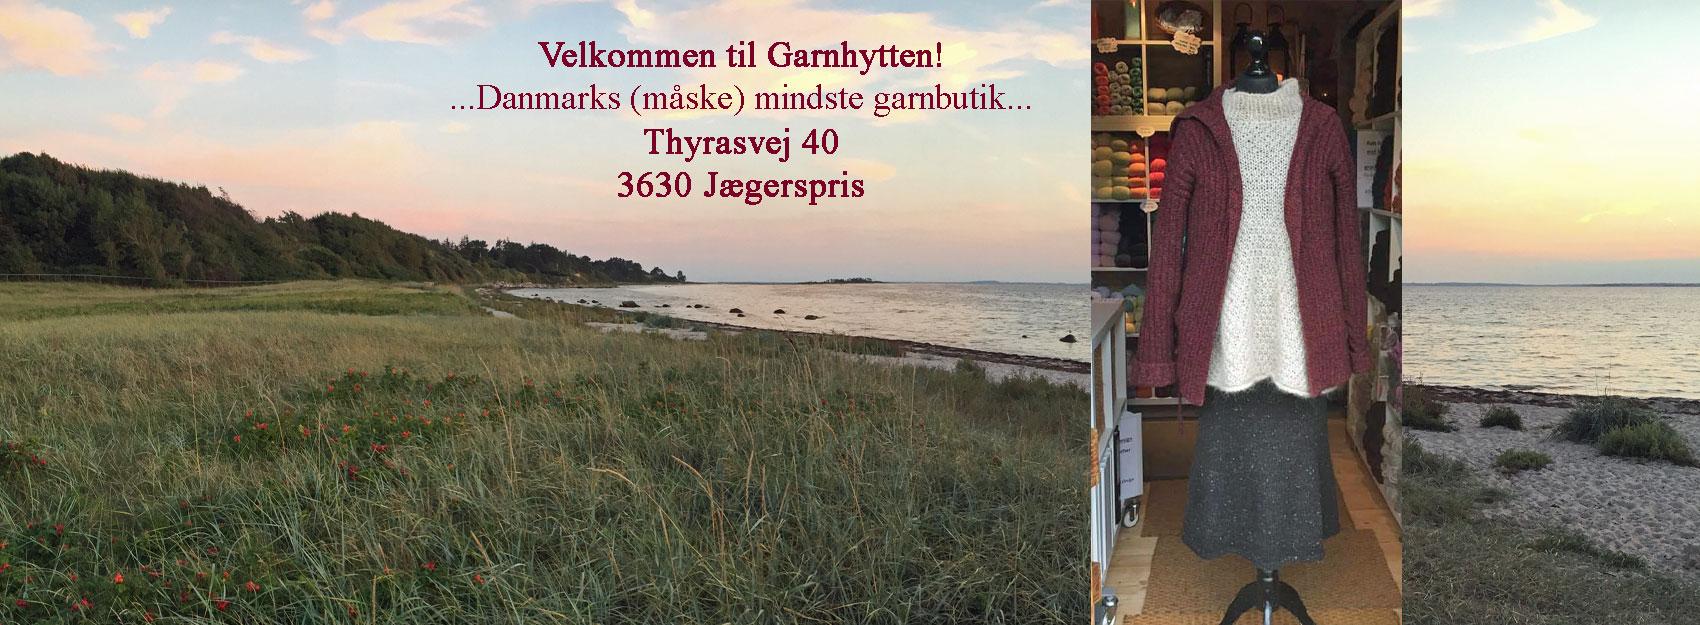 Garnhytten, Jægerspris. Doggerland Designs fysiske garnbutik. Foto: indehaver Marianne Porsborg